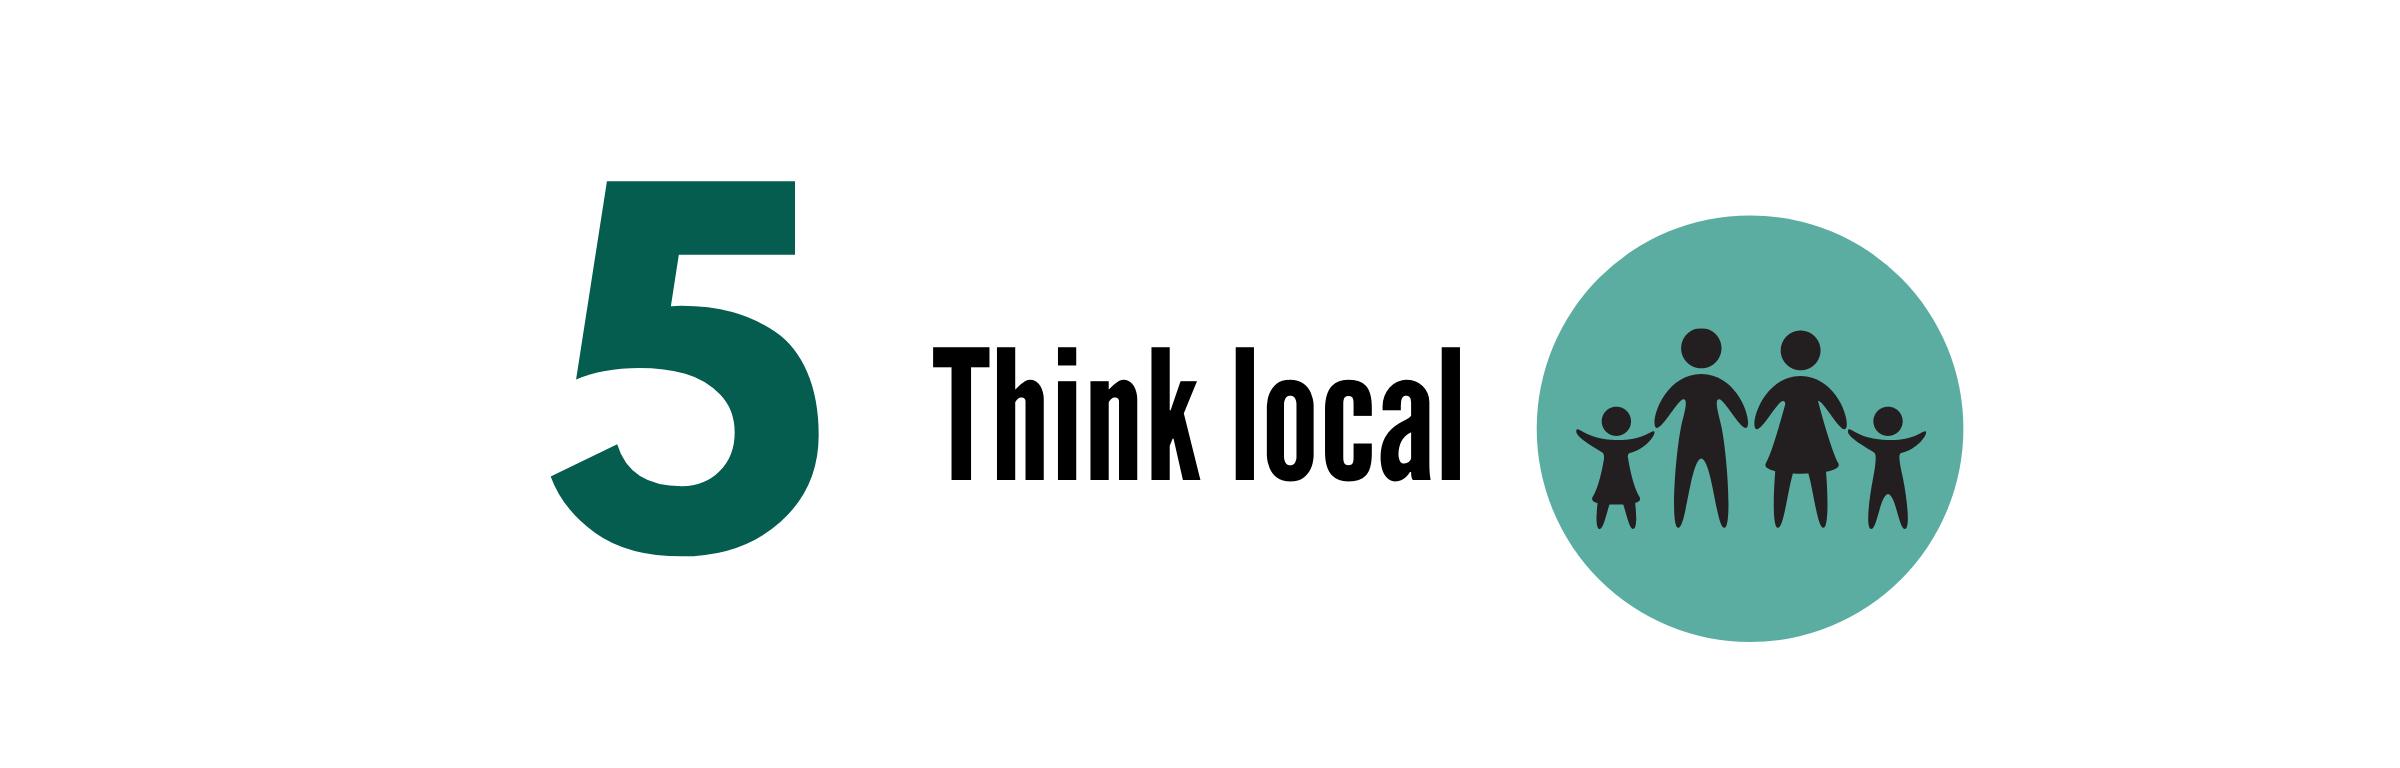 Find local realtors in Concord, NH